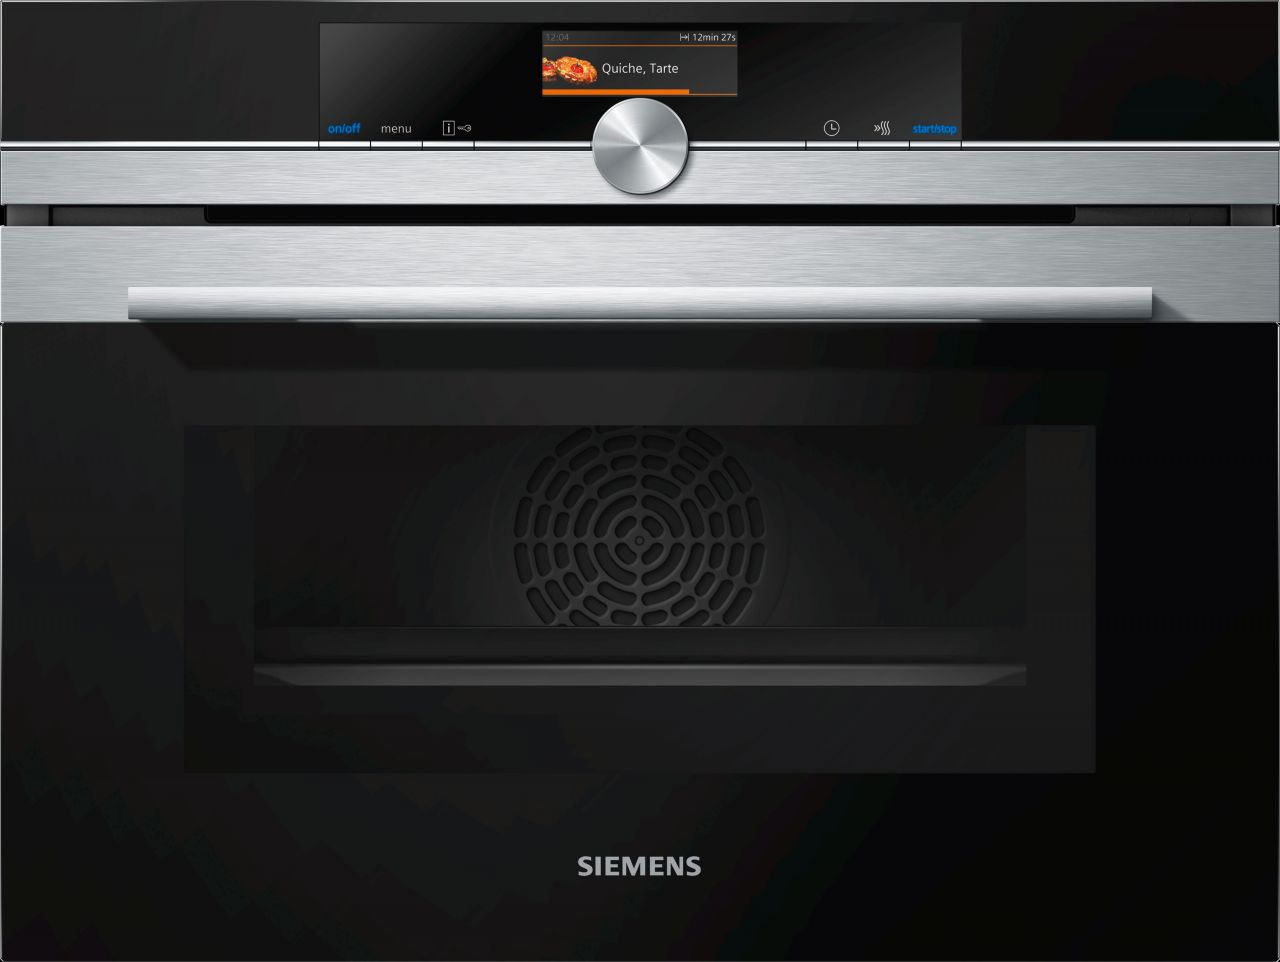 Siemens CM676G0S6